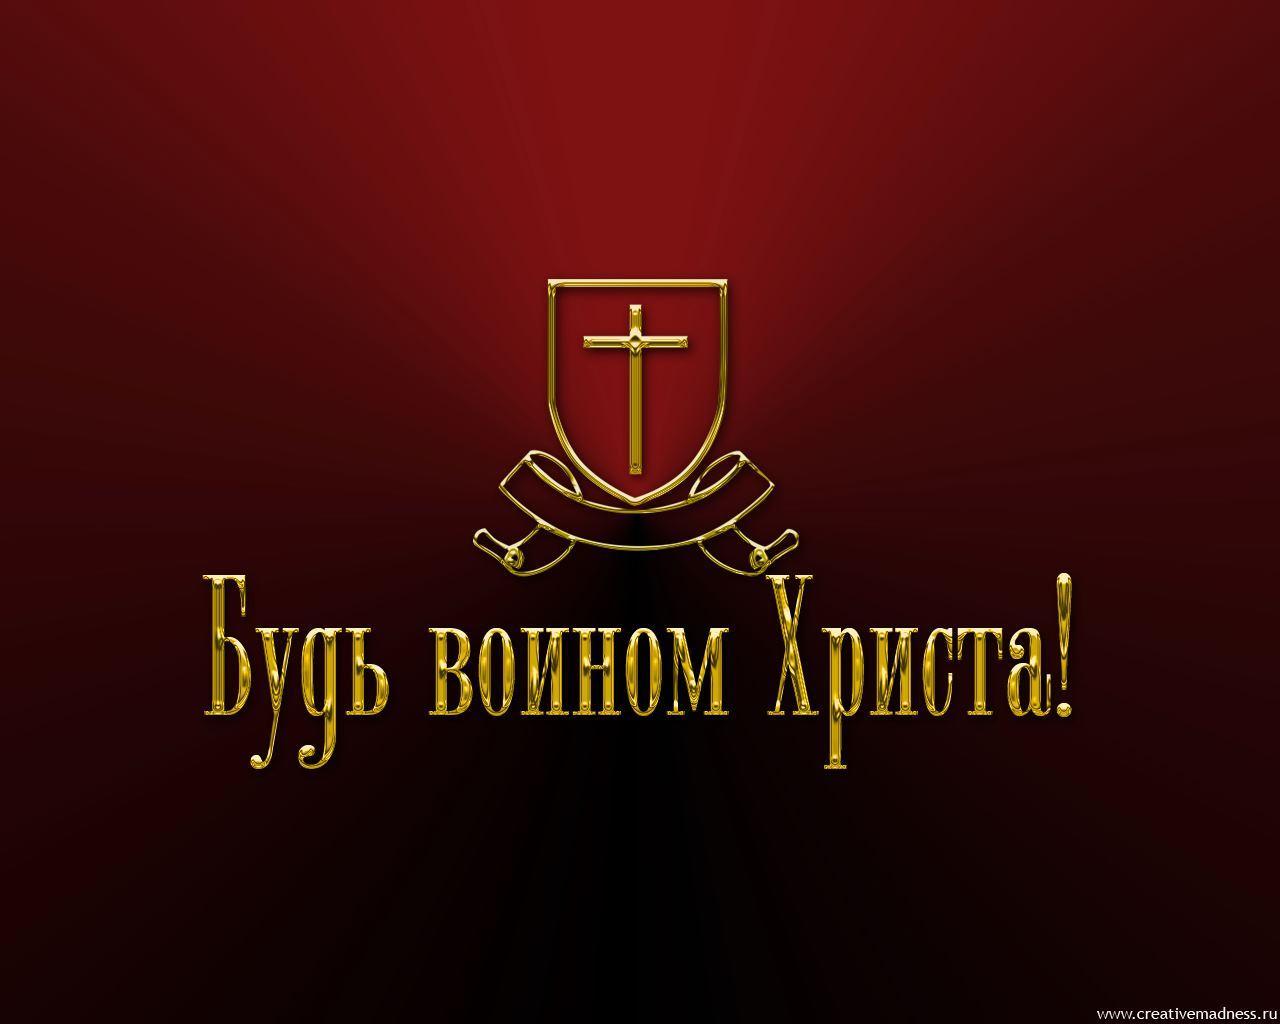 будь воином Христа!